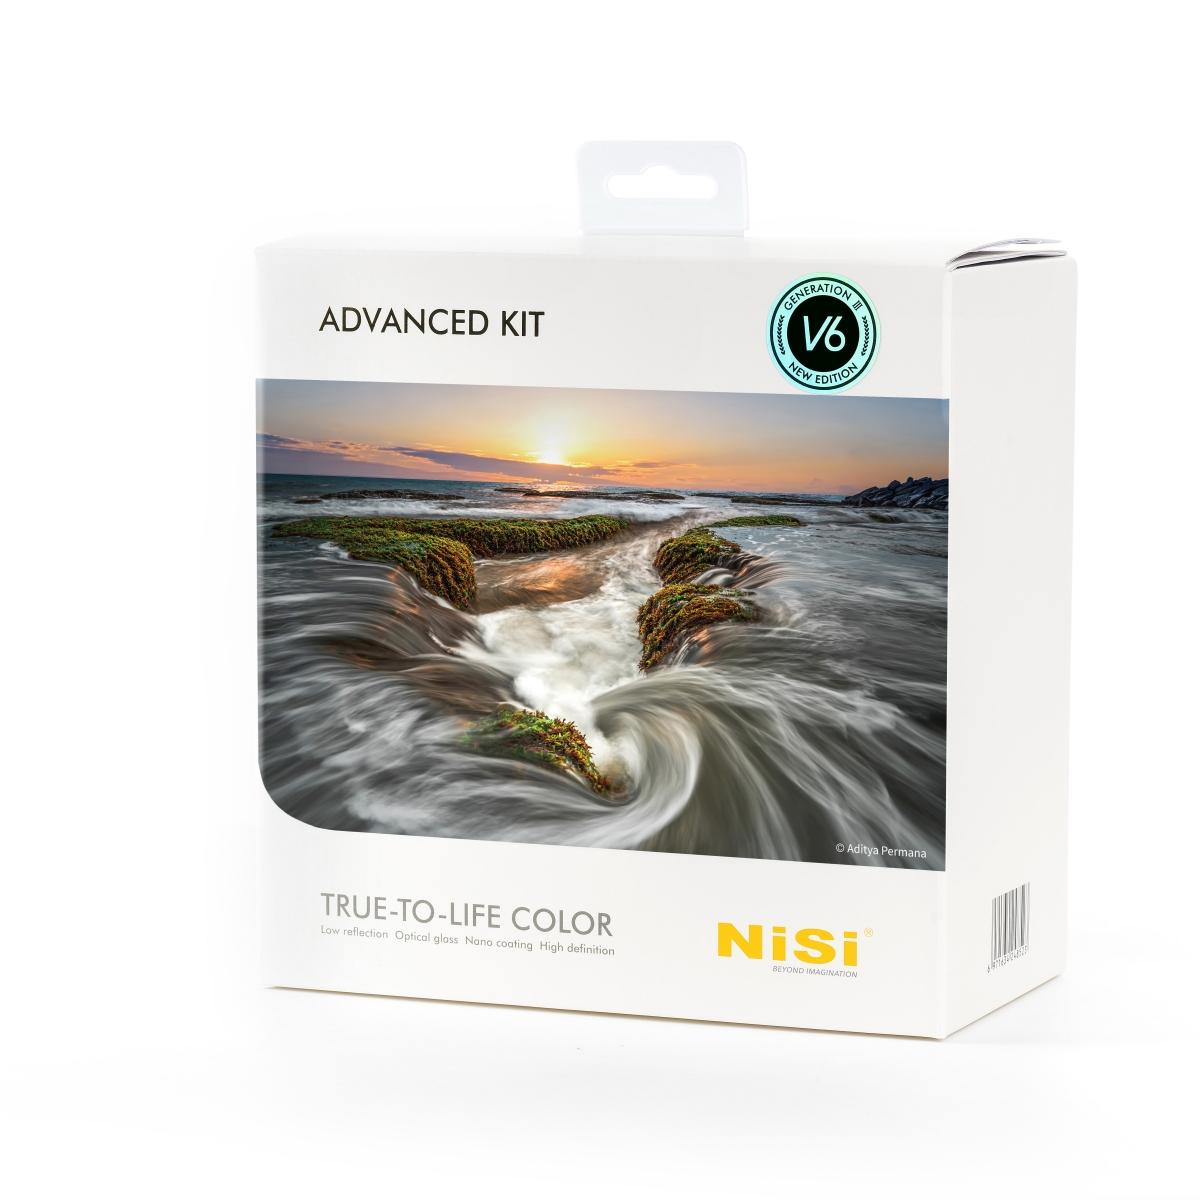 Nisi Advanced Kit V6 (Serie III)